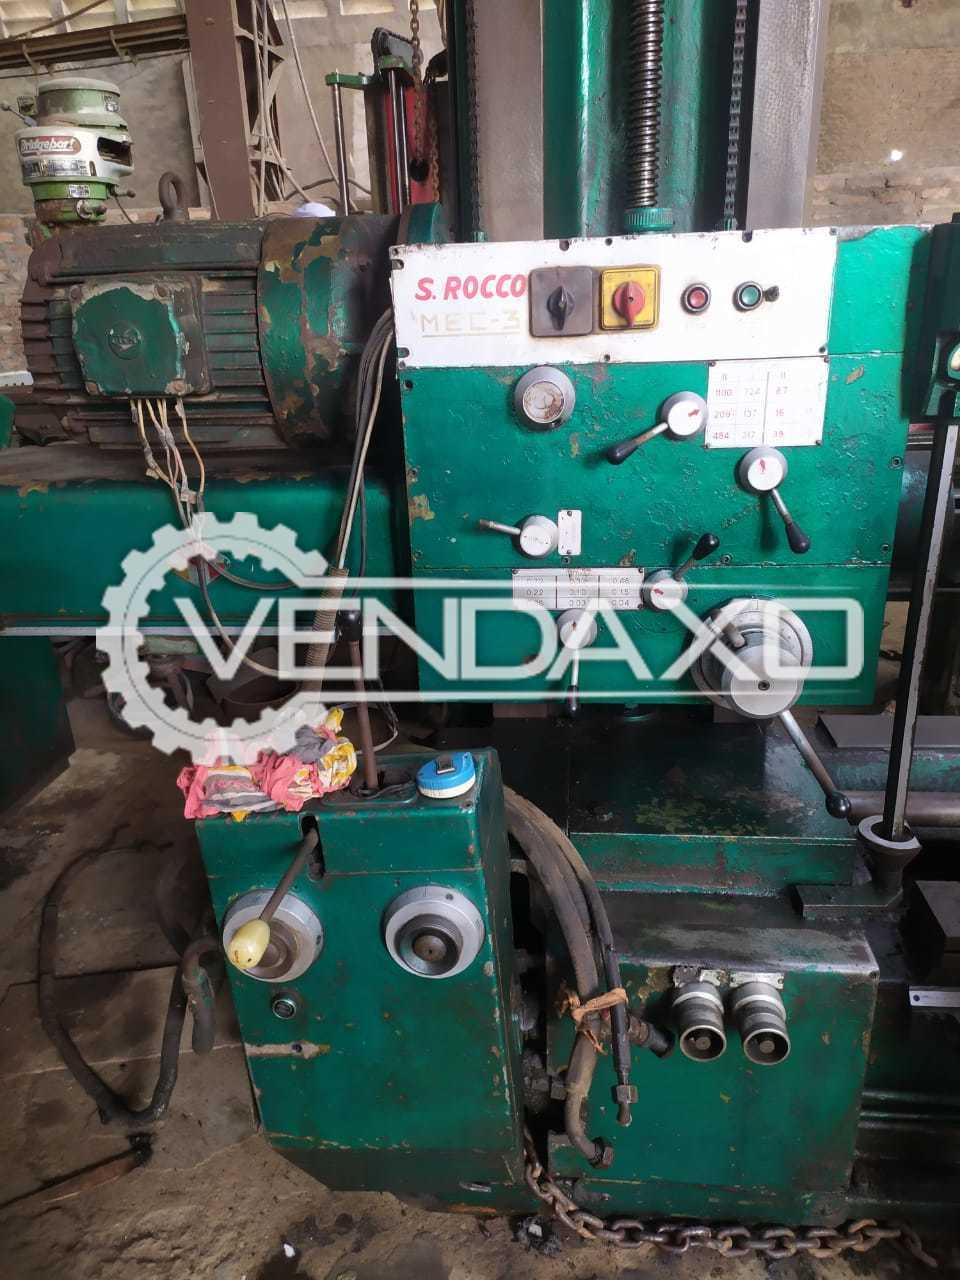 San Rocco Hydraulic Horizontal Boring Machine - Table Size - 36 x 36 Inch